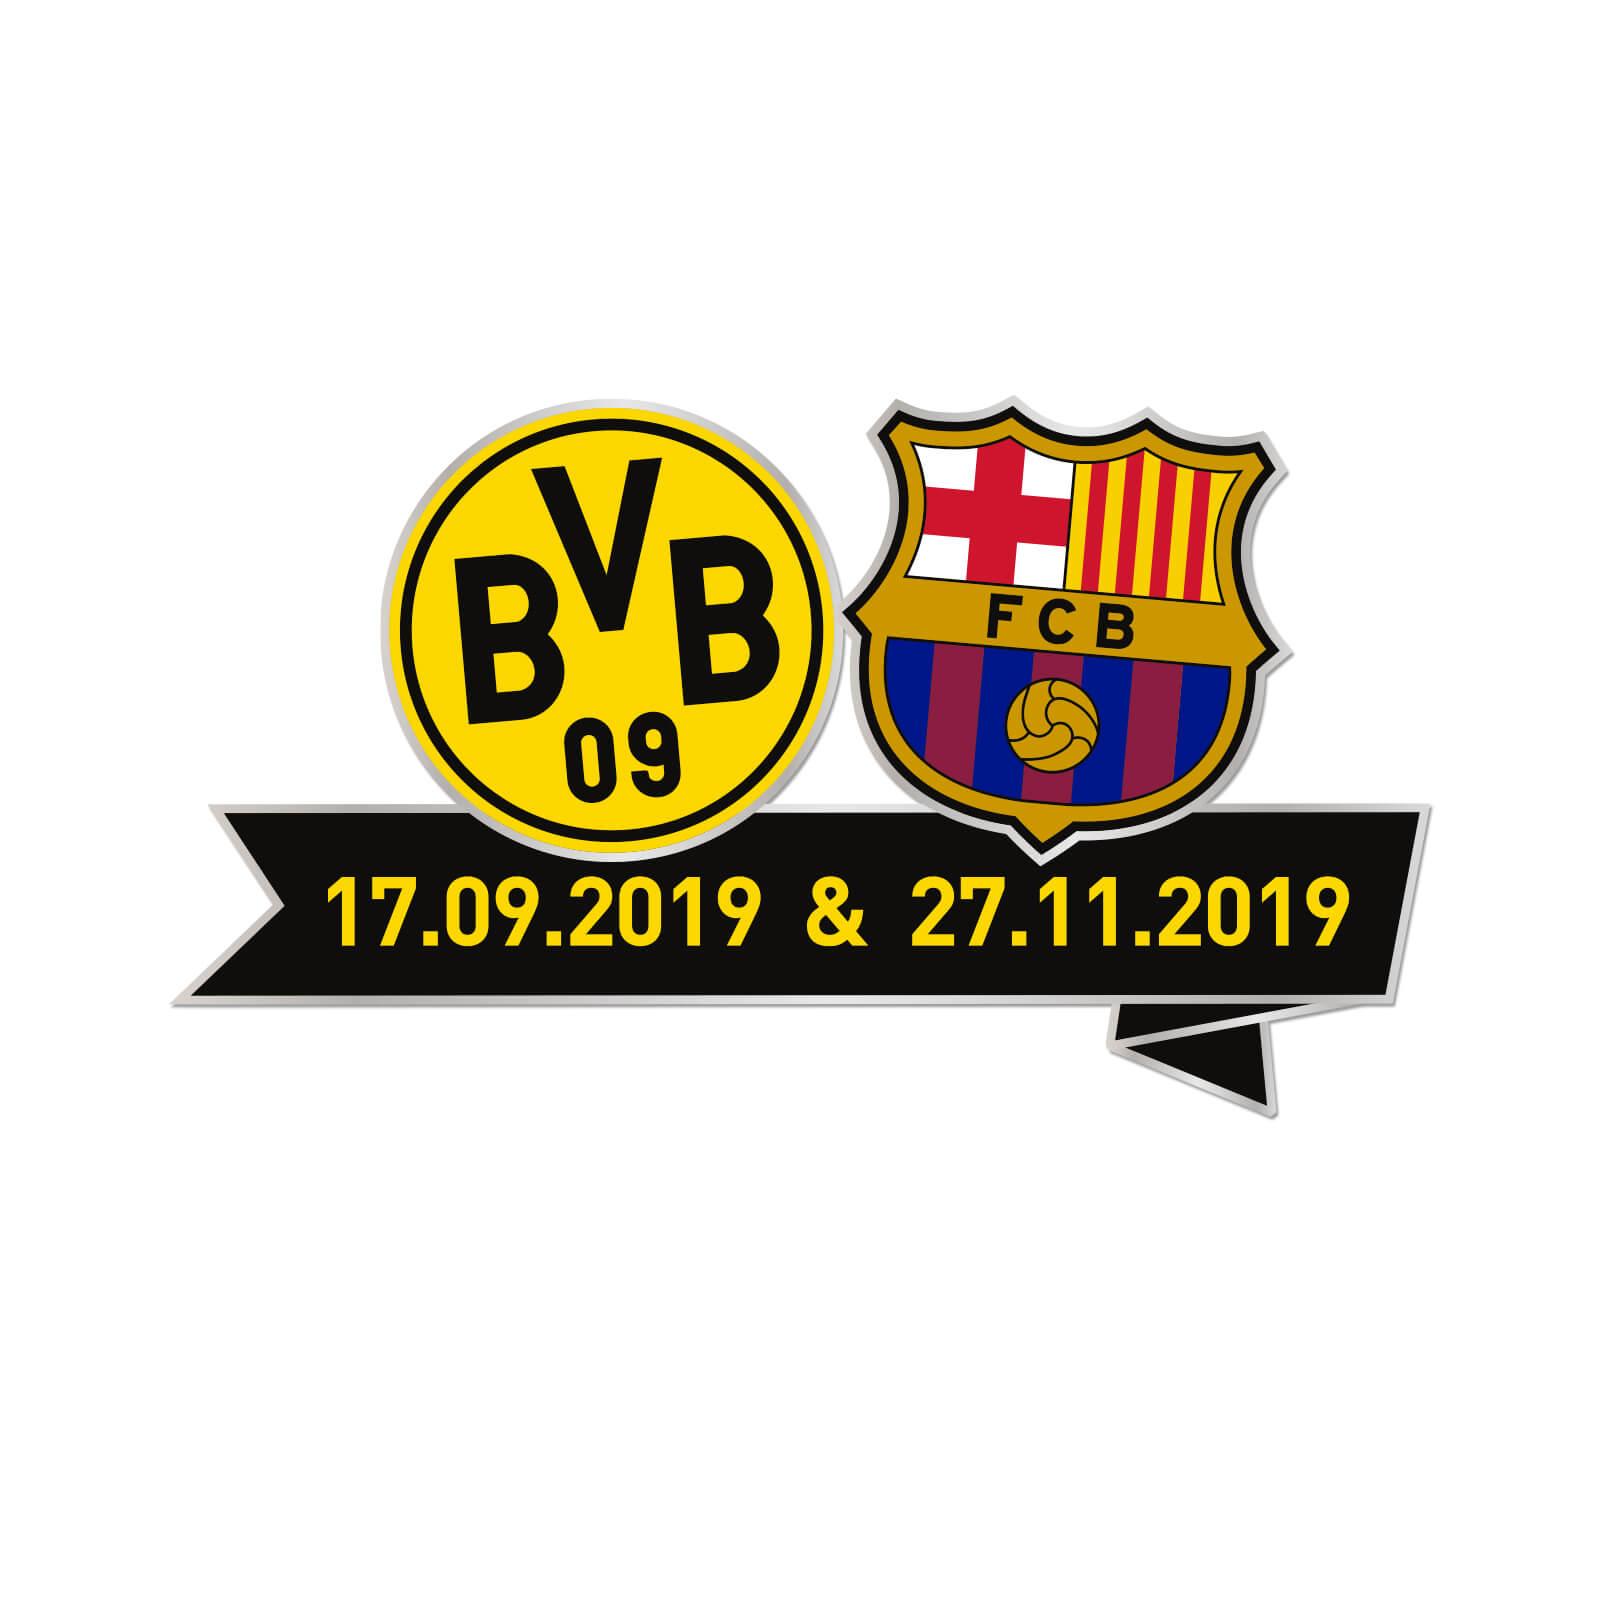 Borussia Dortmund BVB 09 BVB-Radiergummi